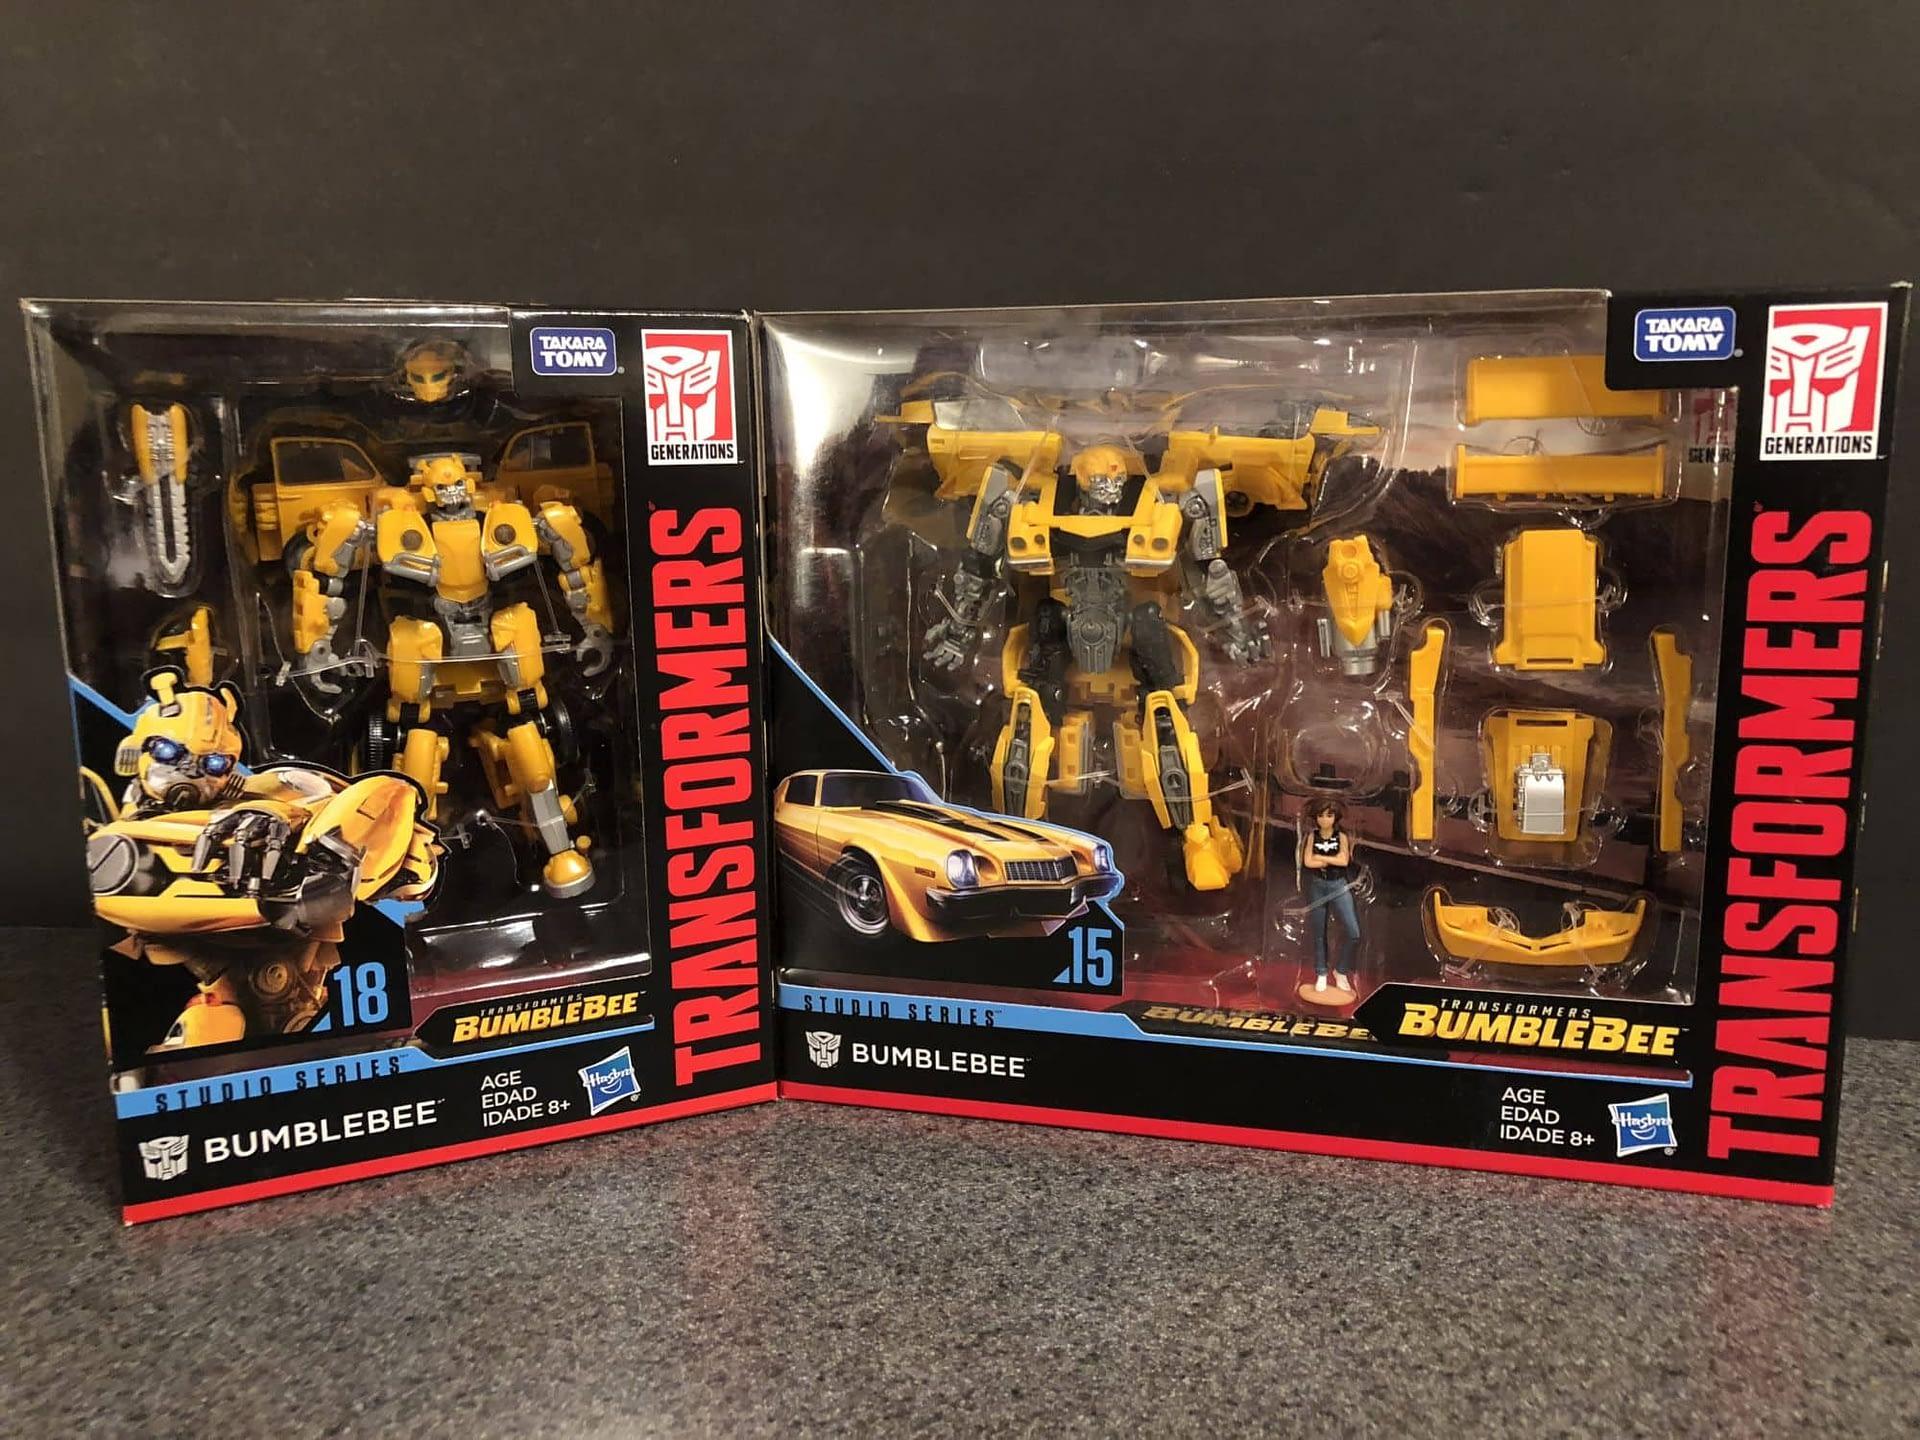 Hasbro Bumblebee Toys 3